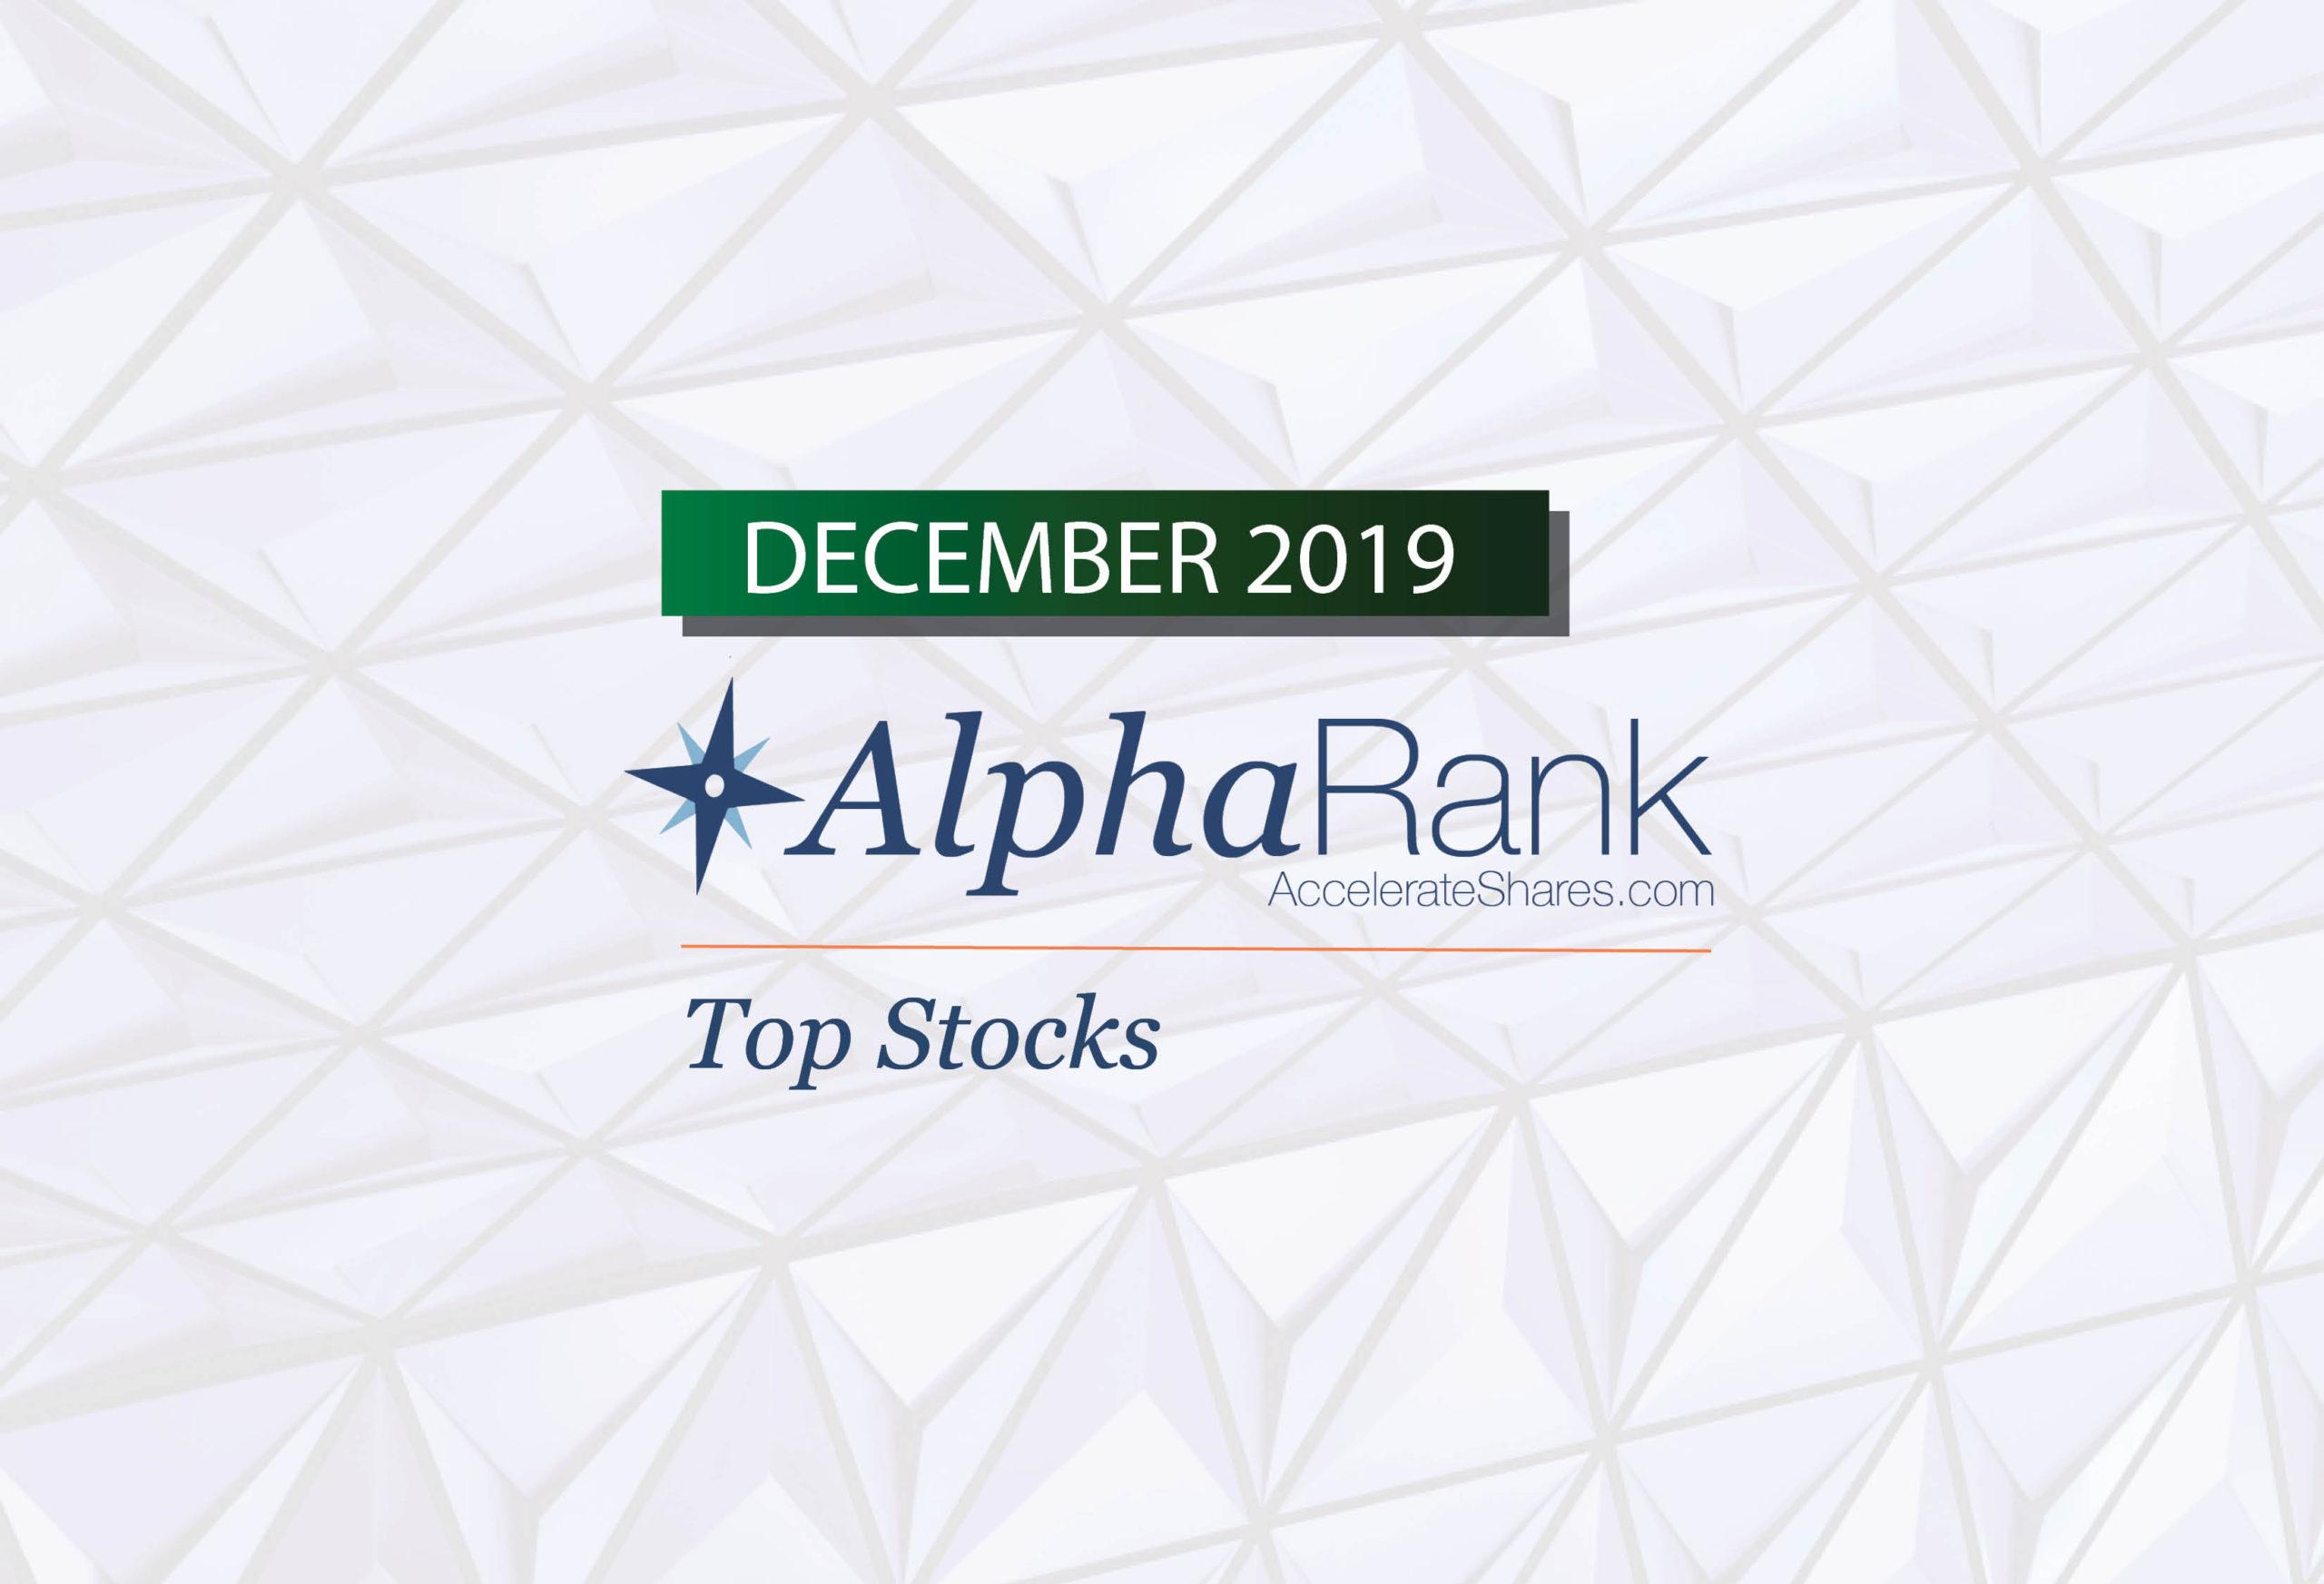 AlphaRank Top Stocks—December 2019